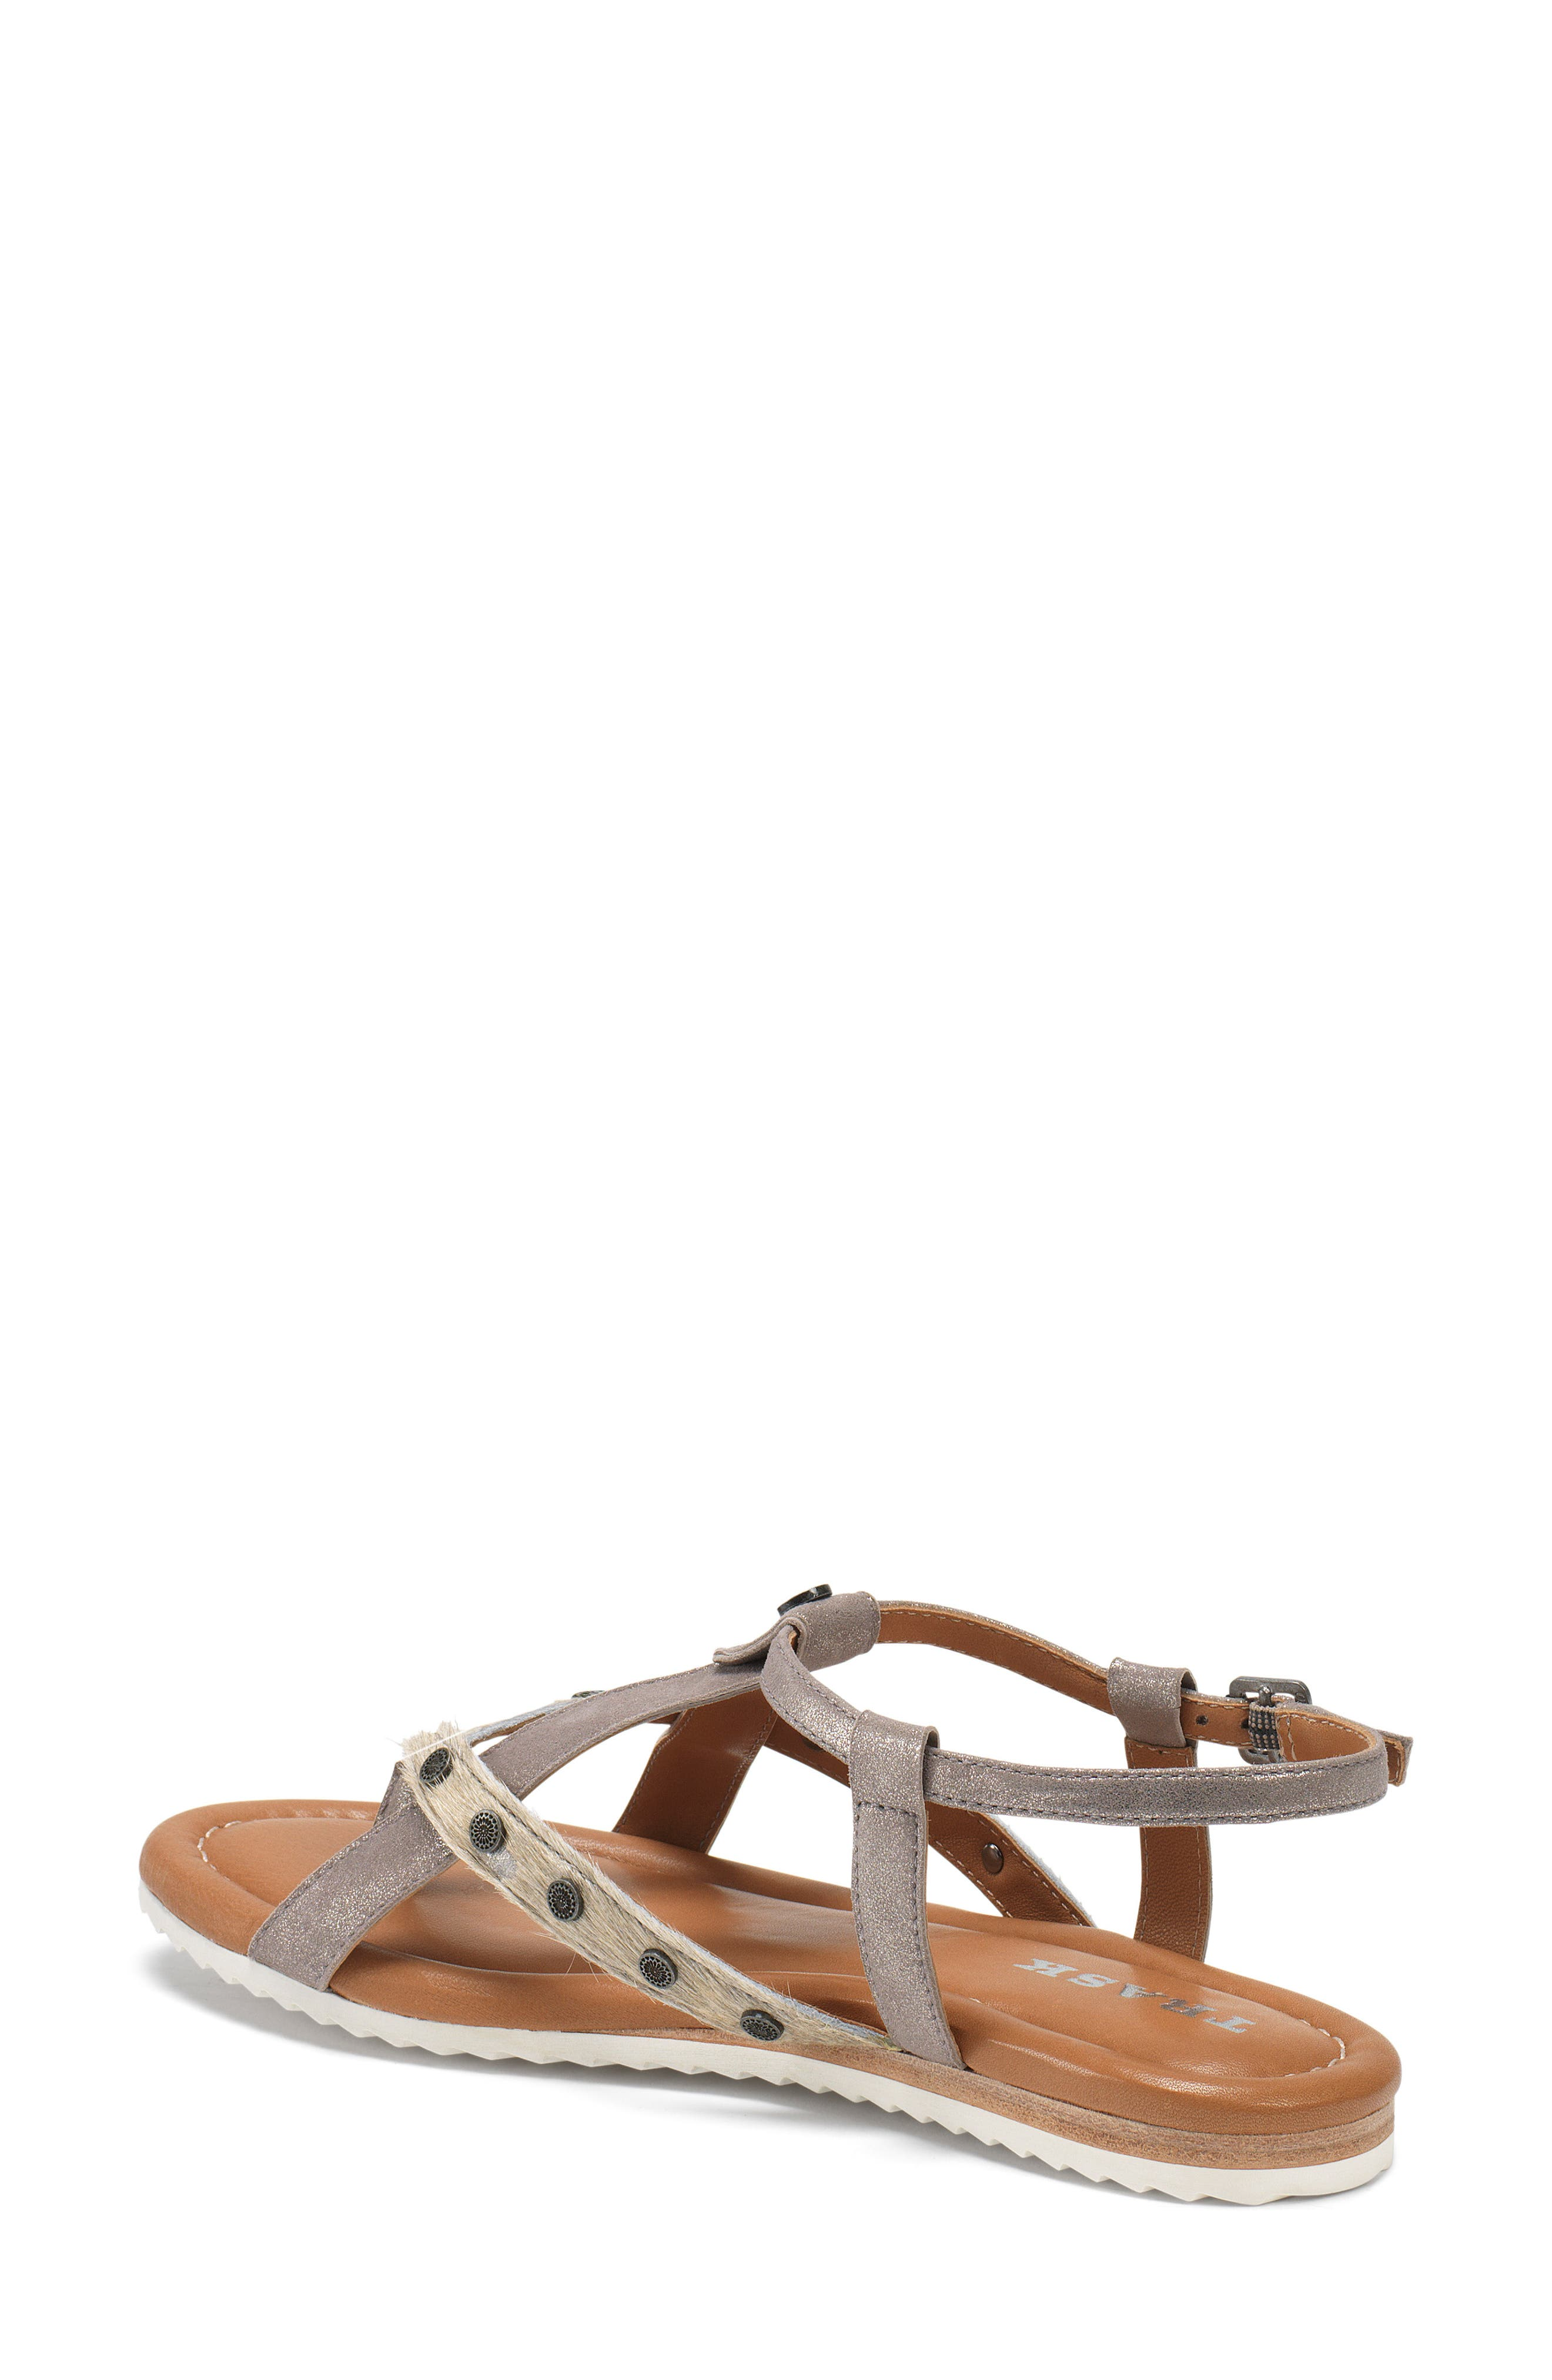 Shayla Water Resistant Sandal,                             Alternate thumbnail 2, color,                             PEWTER/ BONE SUEDE